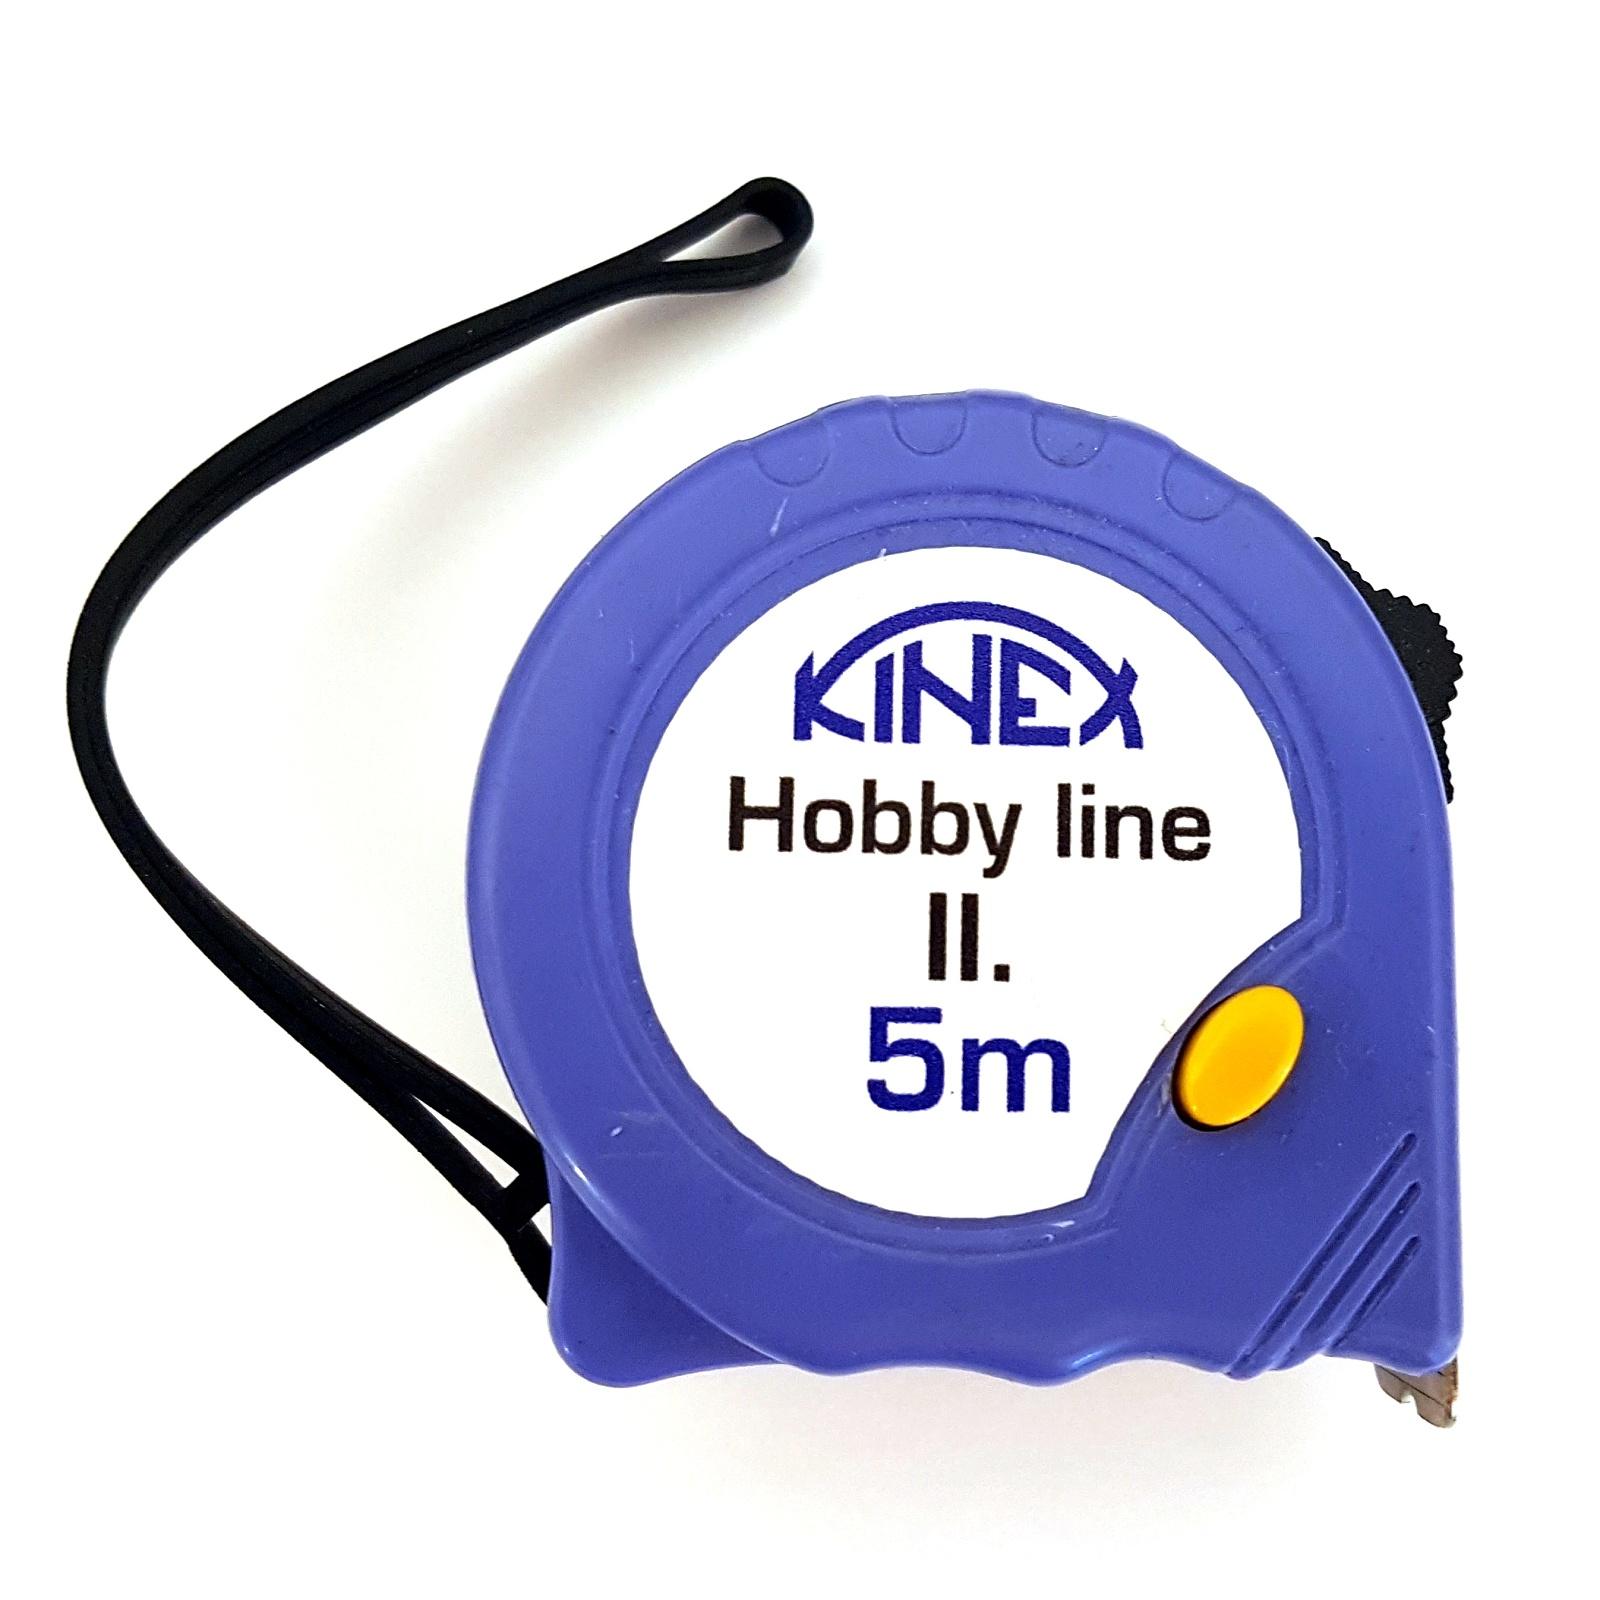 Svinovací metr KINEX Hobby Line II 7,5m | 8004-2